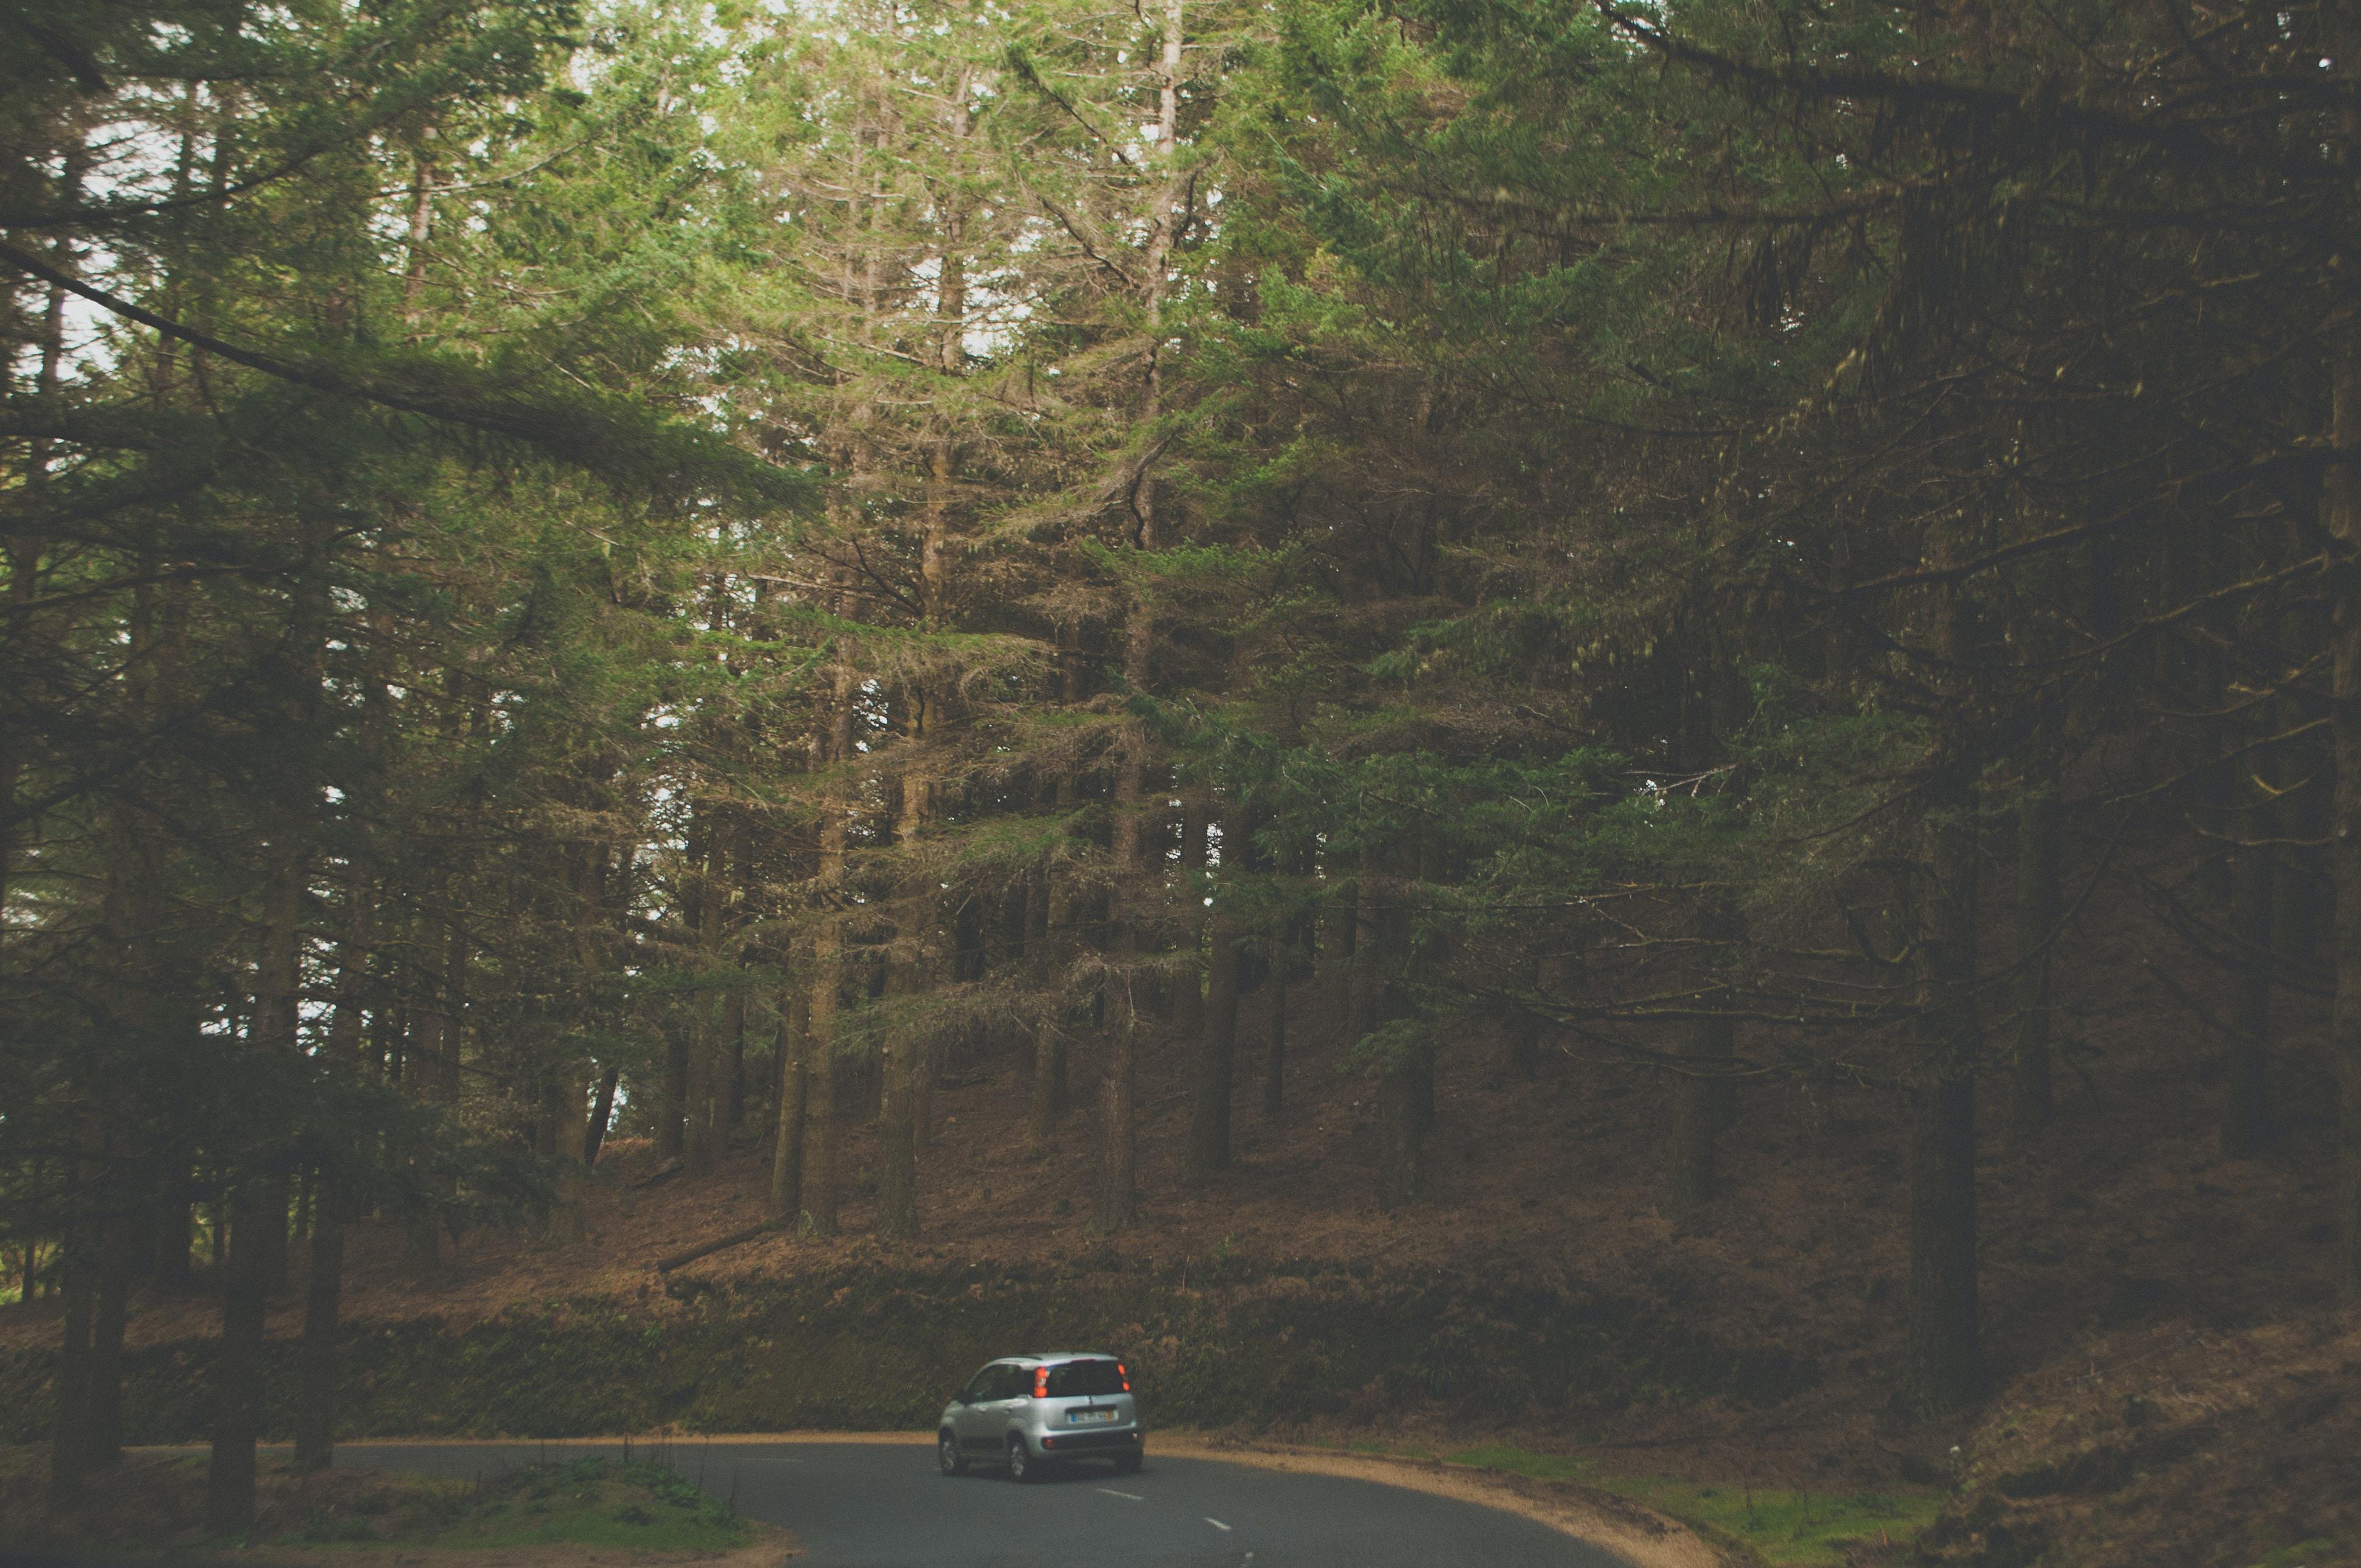 gray car near green trees at daytime